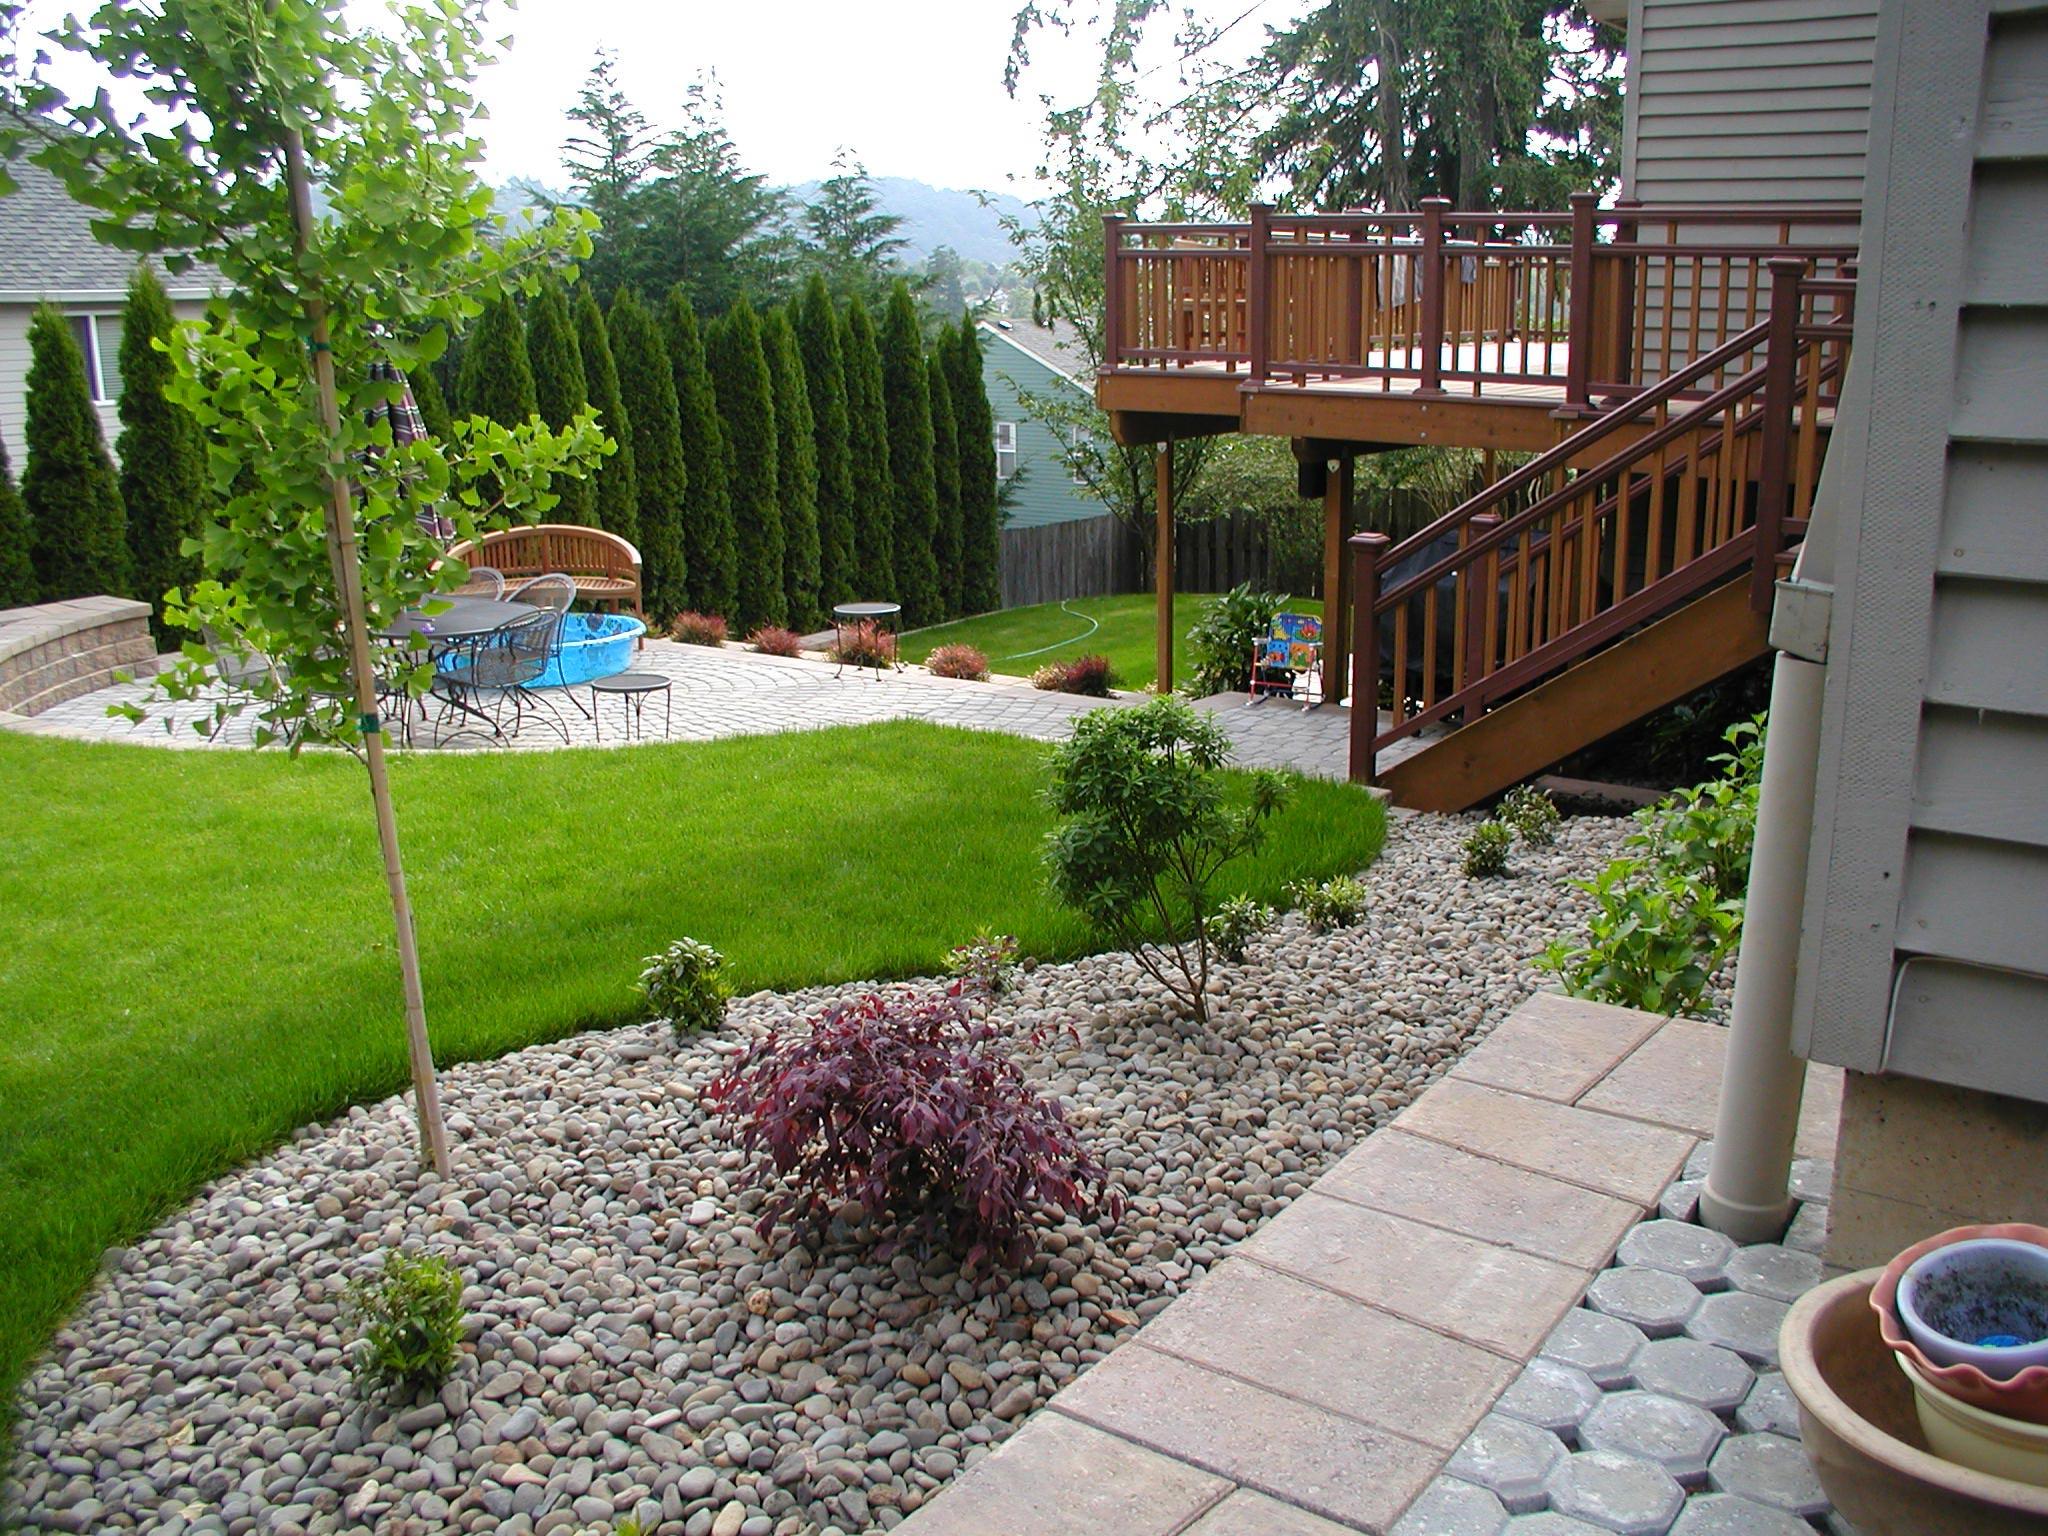 Landscape design ideas around patio